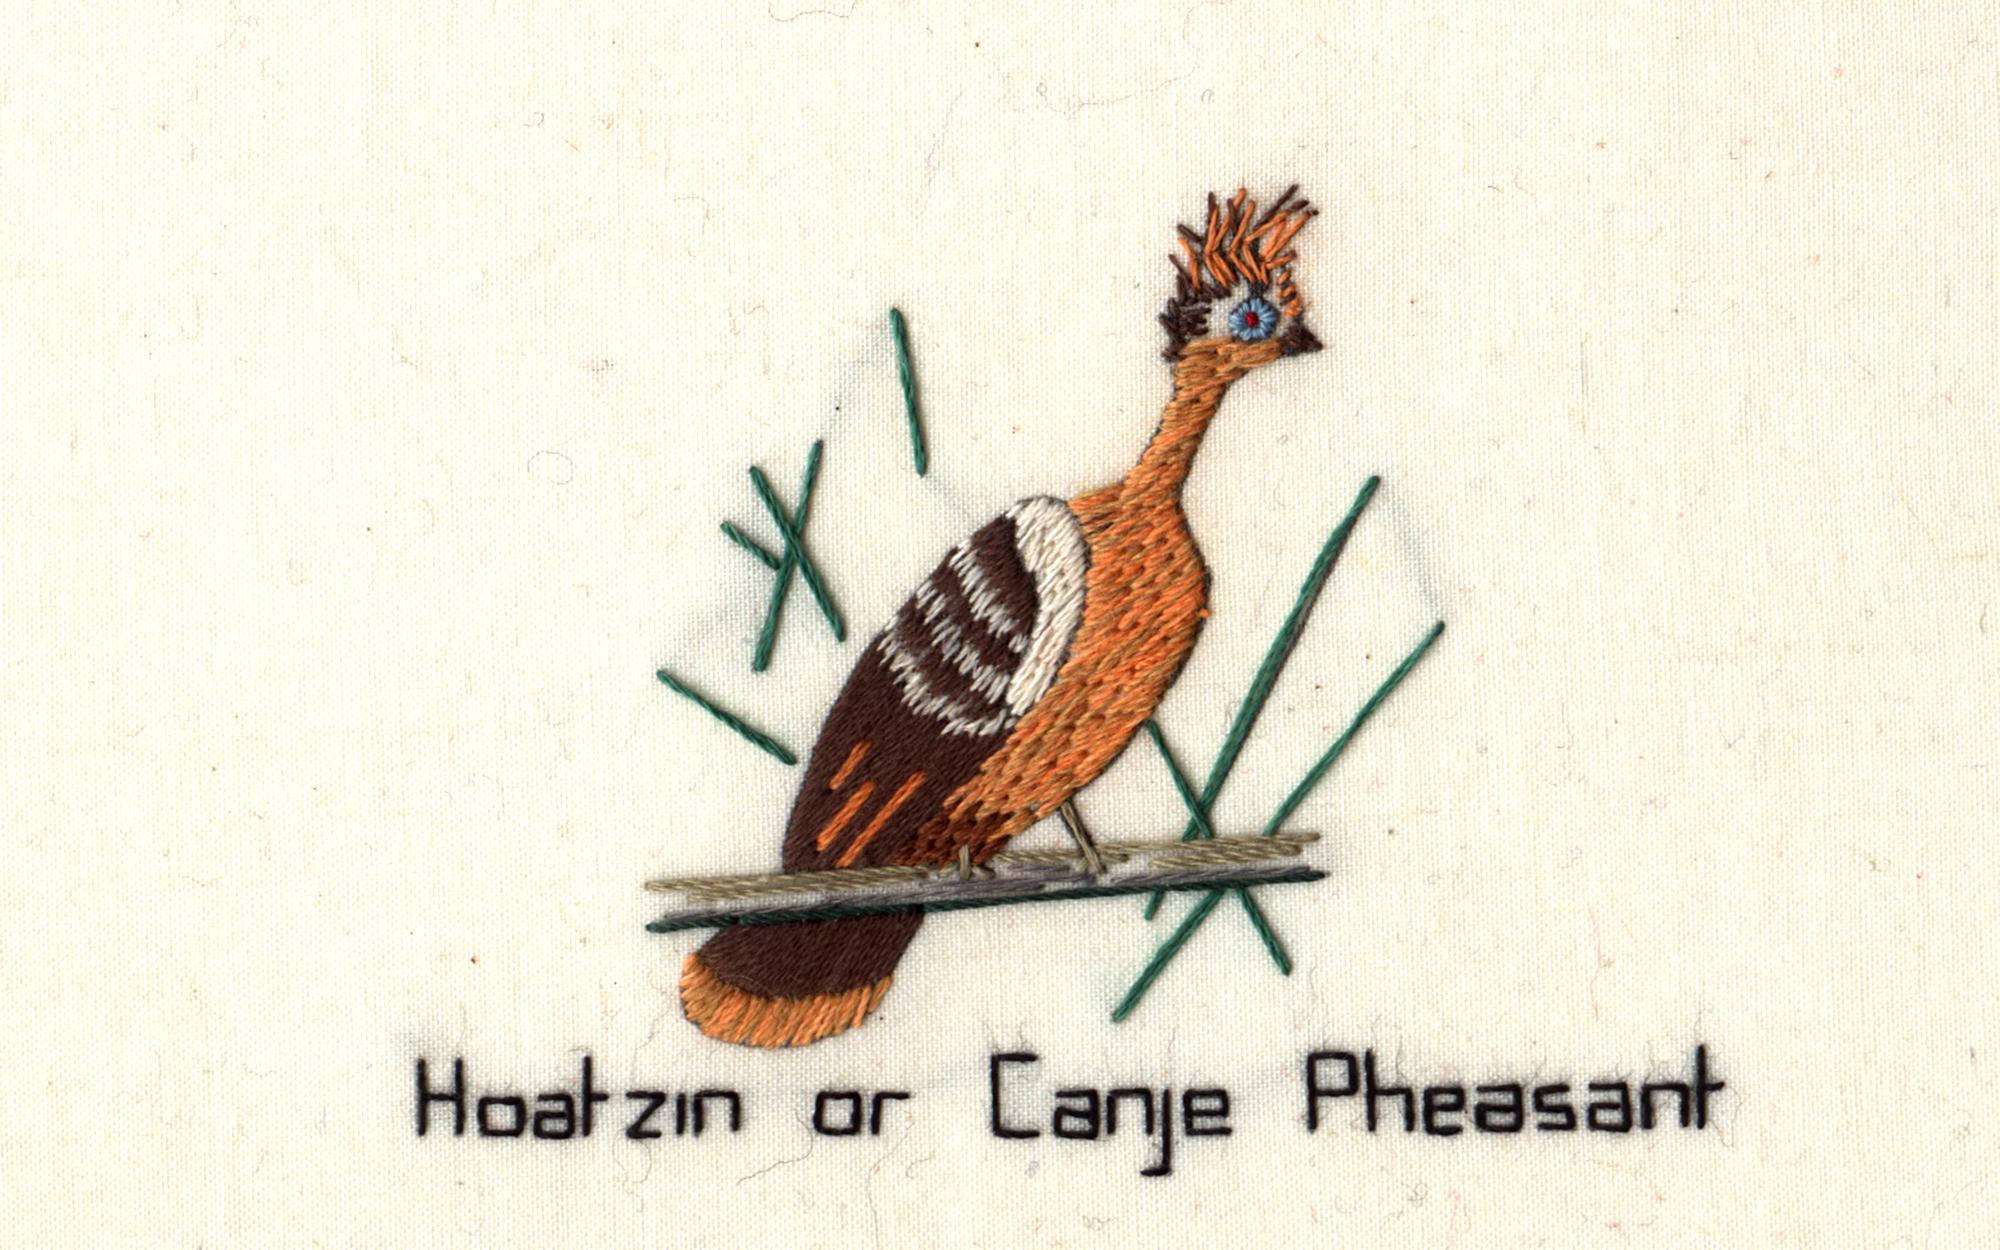 Canje Pheasant Kit